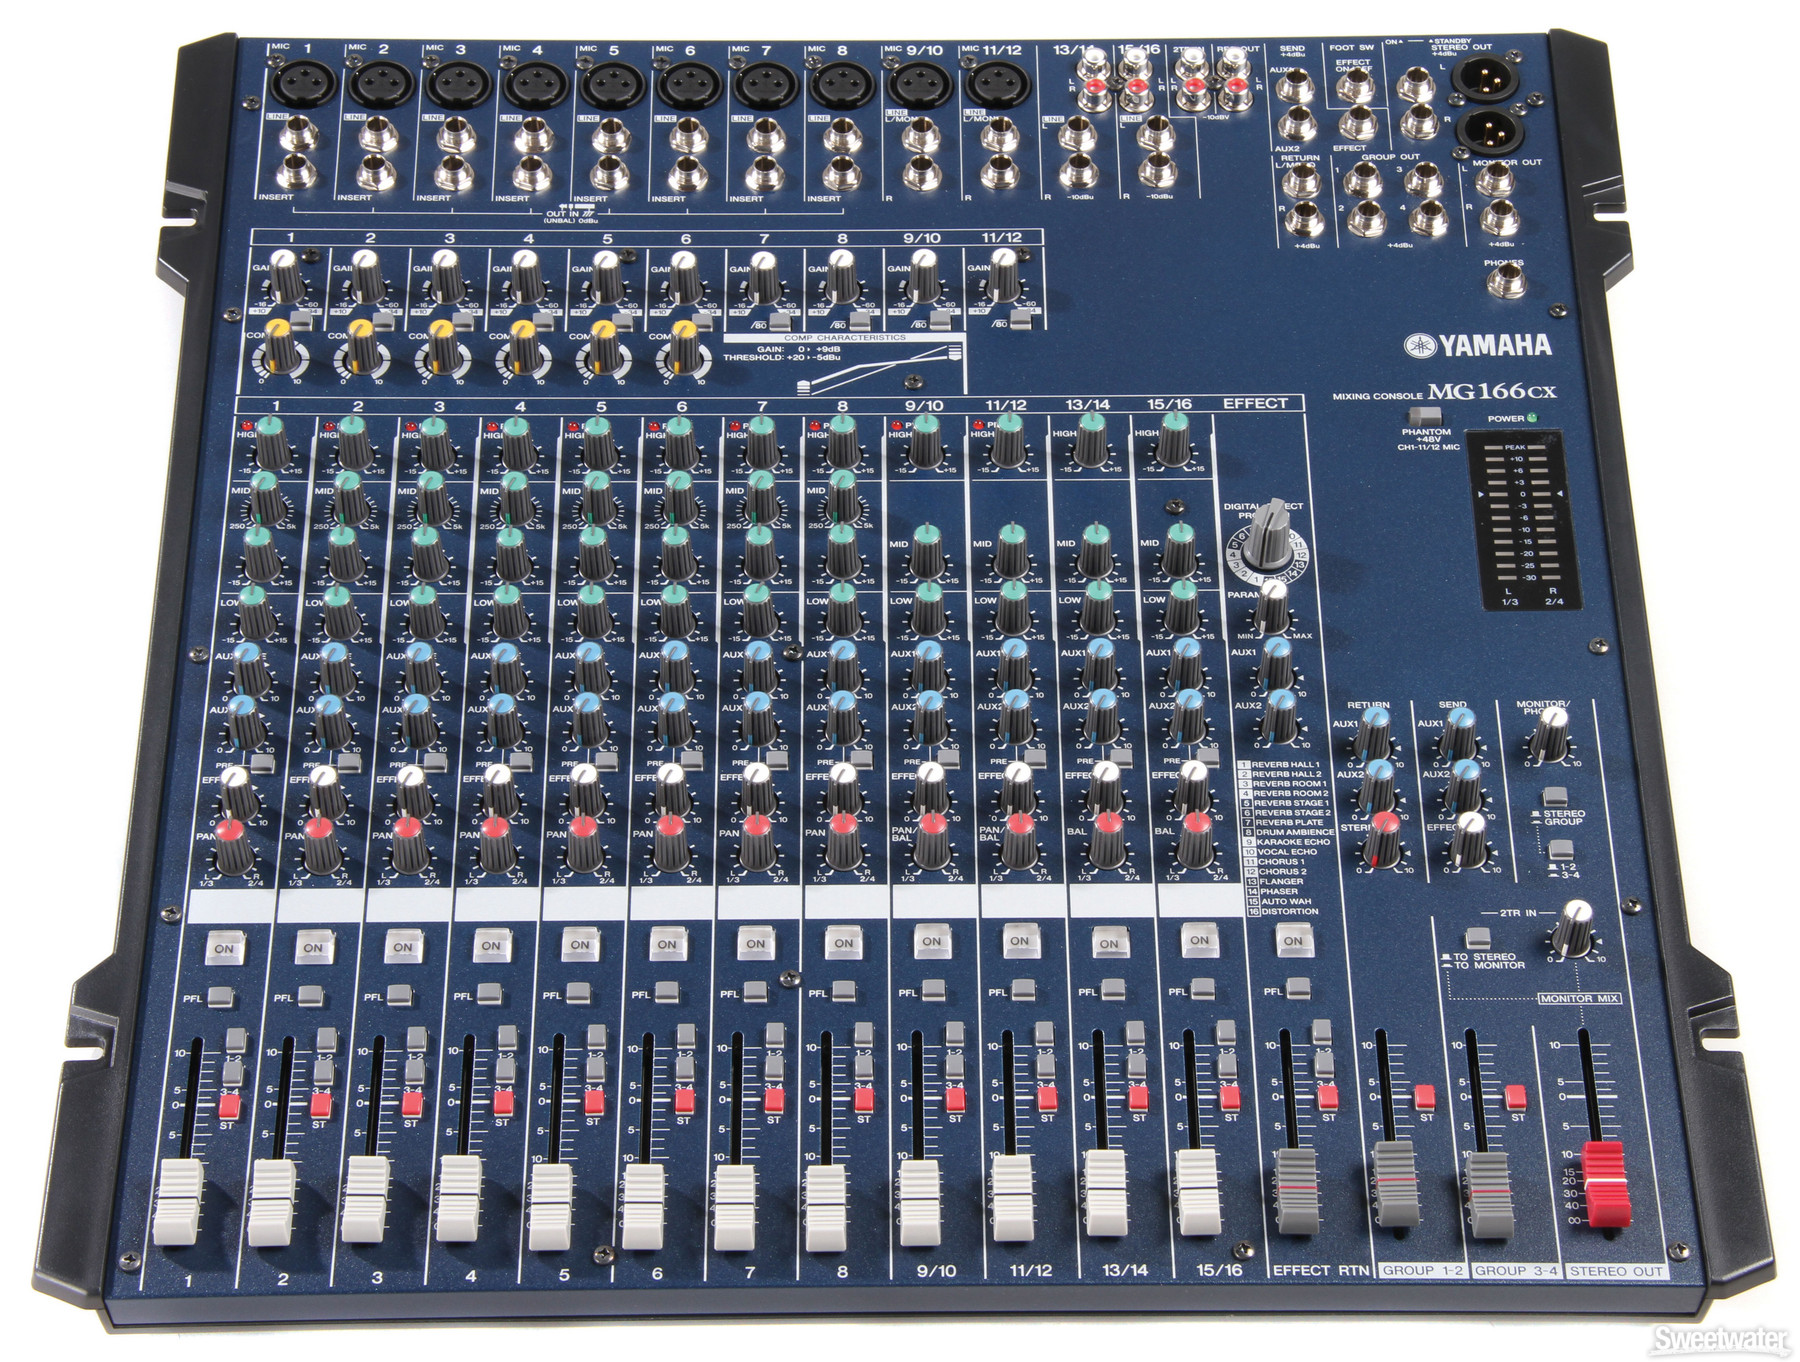 yamaha mg166cx image 691218 audiofanzine rh en audiofanzine com yamaha mg166cx user manual yamaha mg166cx instruction manual